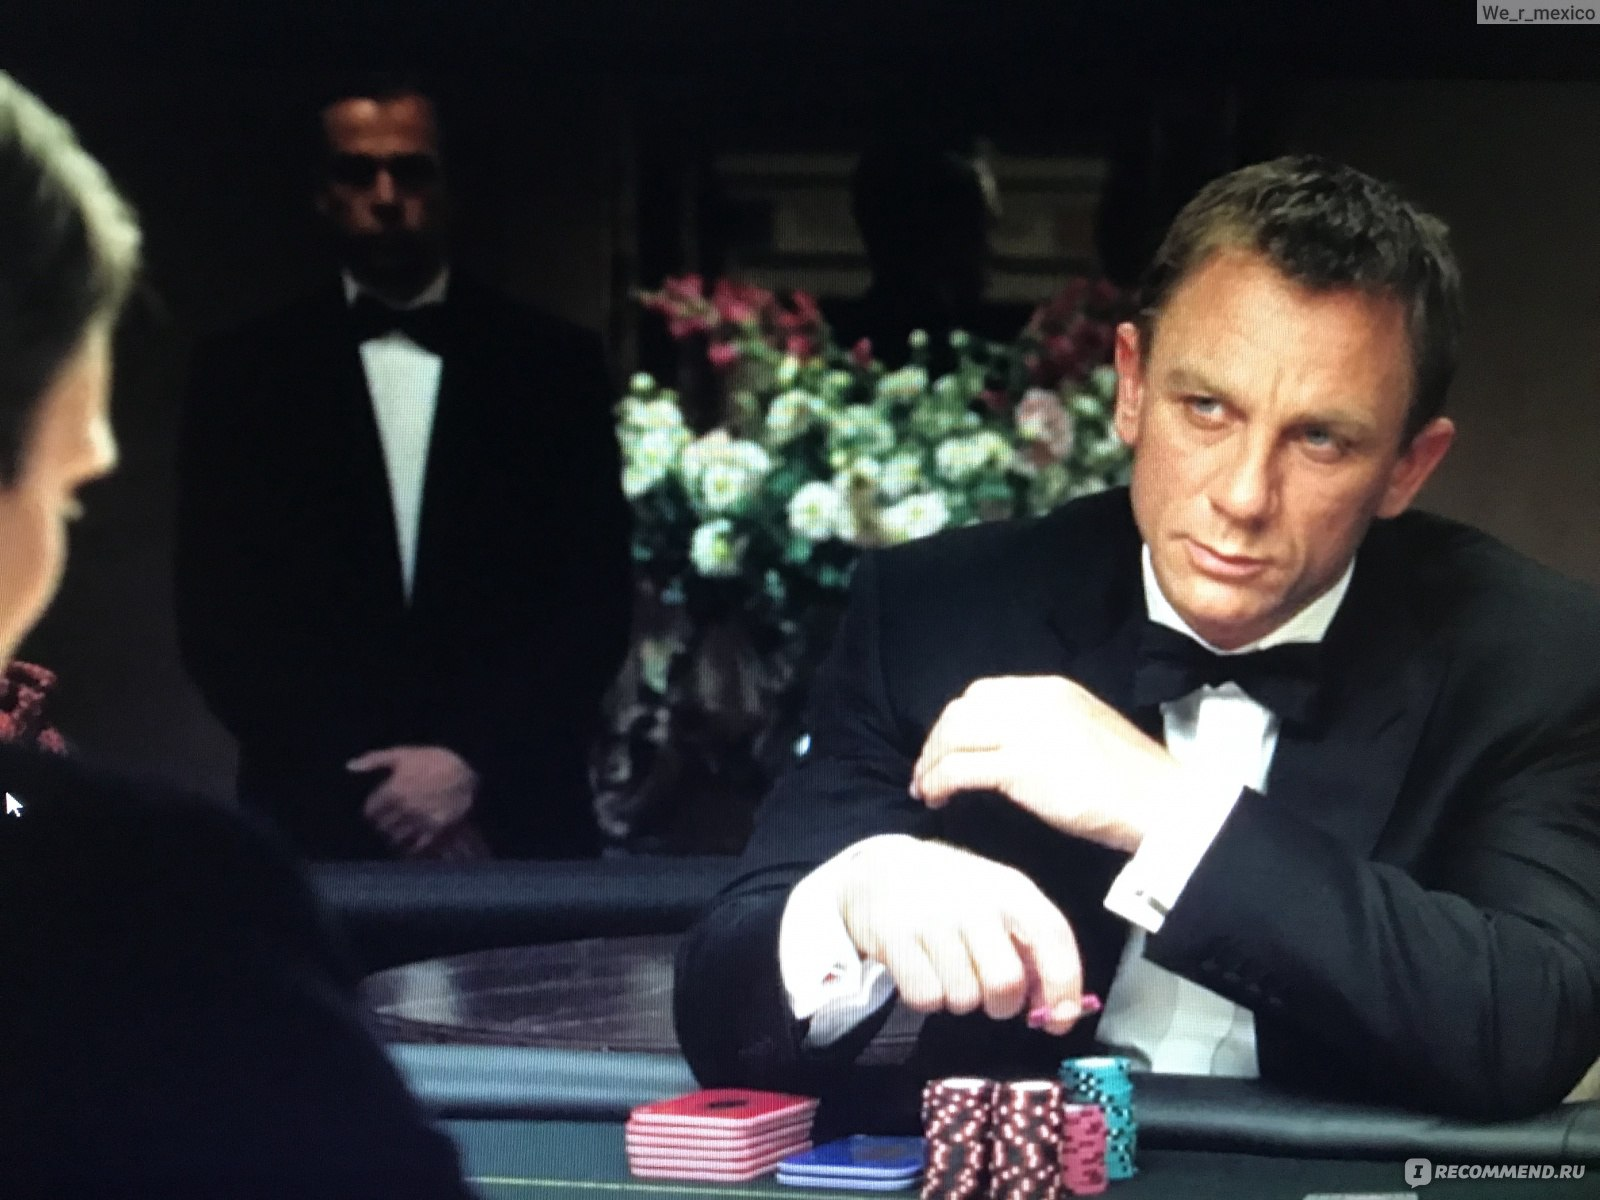 Х.ф казино рояль online casino reviews nj